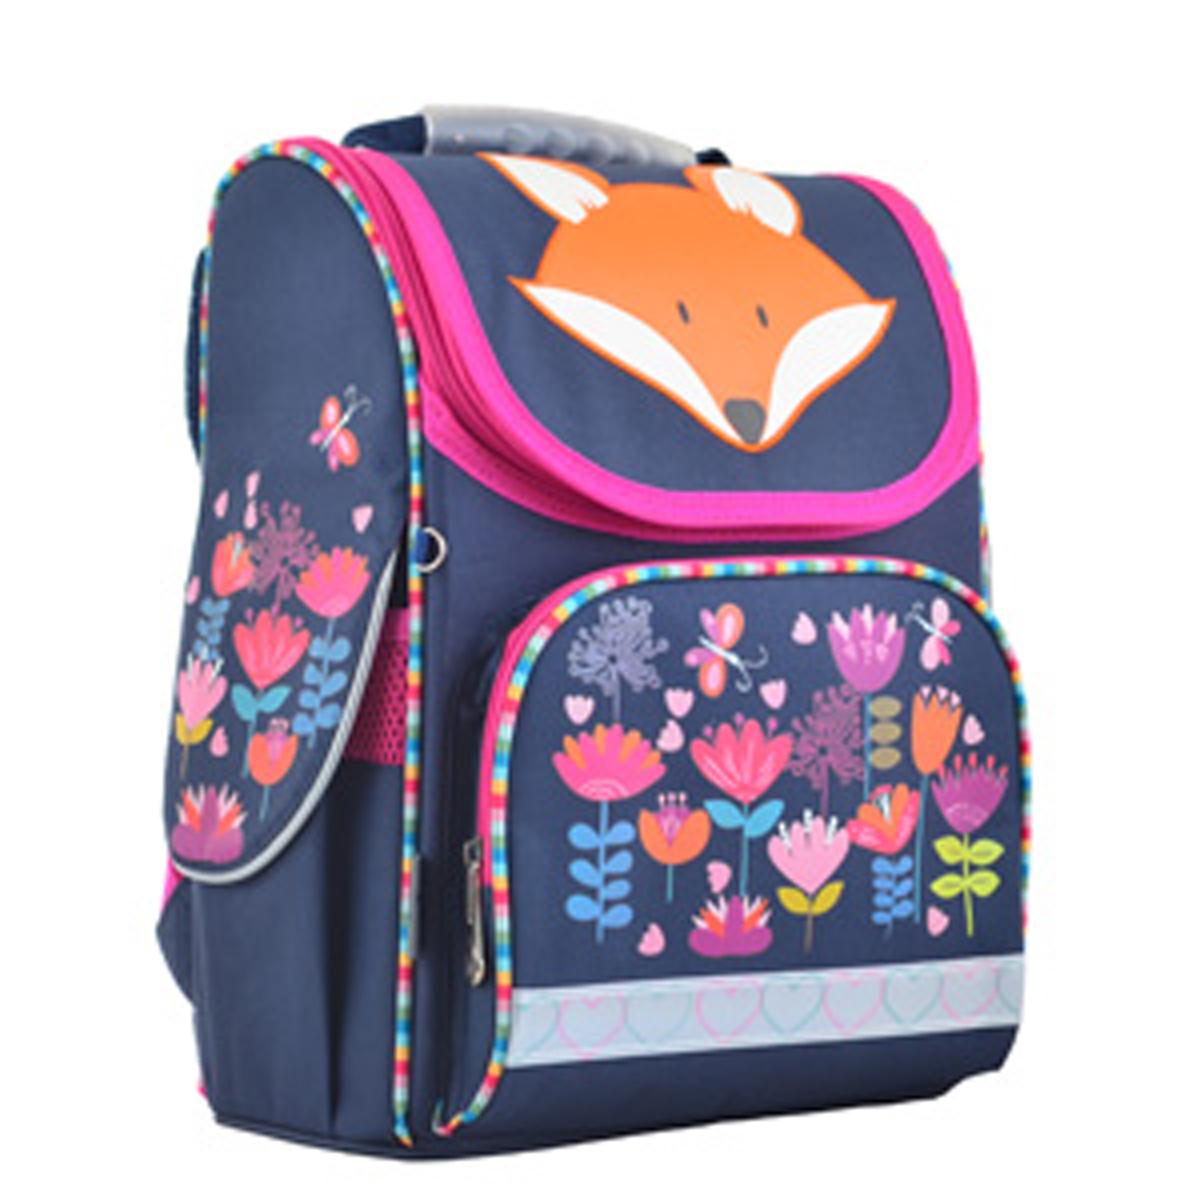 Рюкзак каркасный H-11 Fox, 33.5*26*13.5